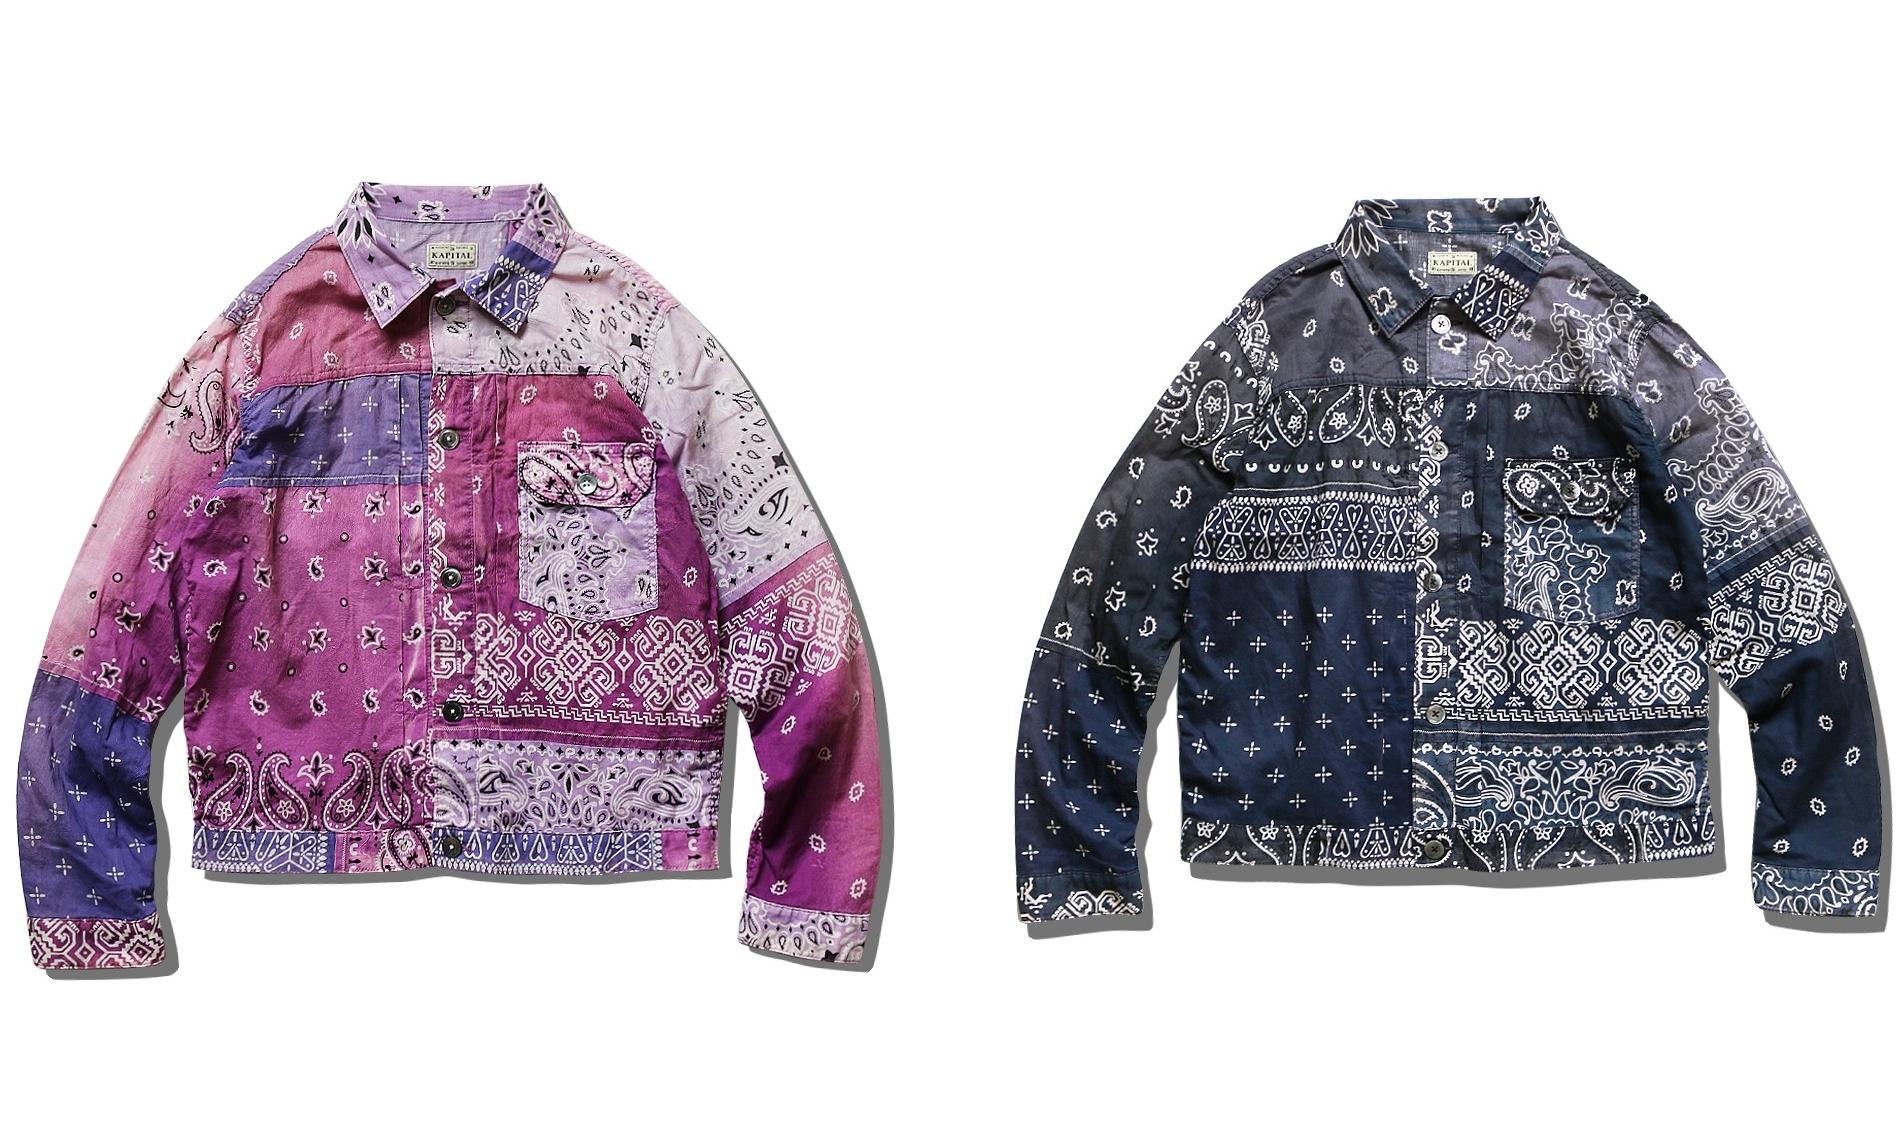 KAPITAL 新款 Bandana 拼布夹克系列现已开售